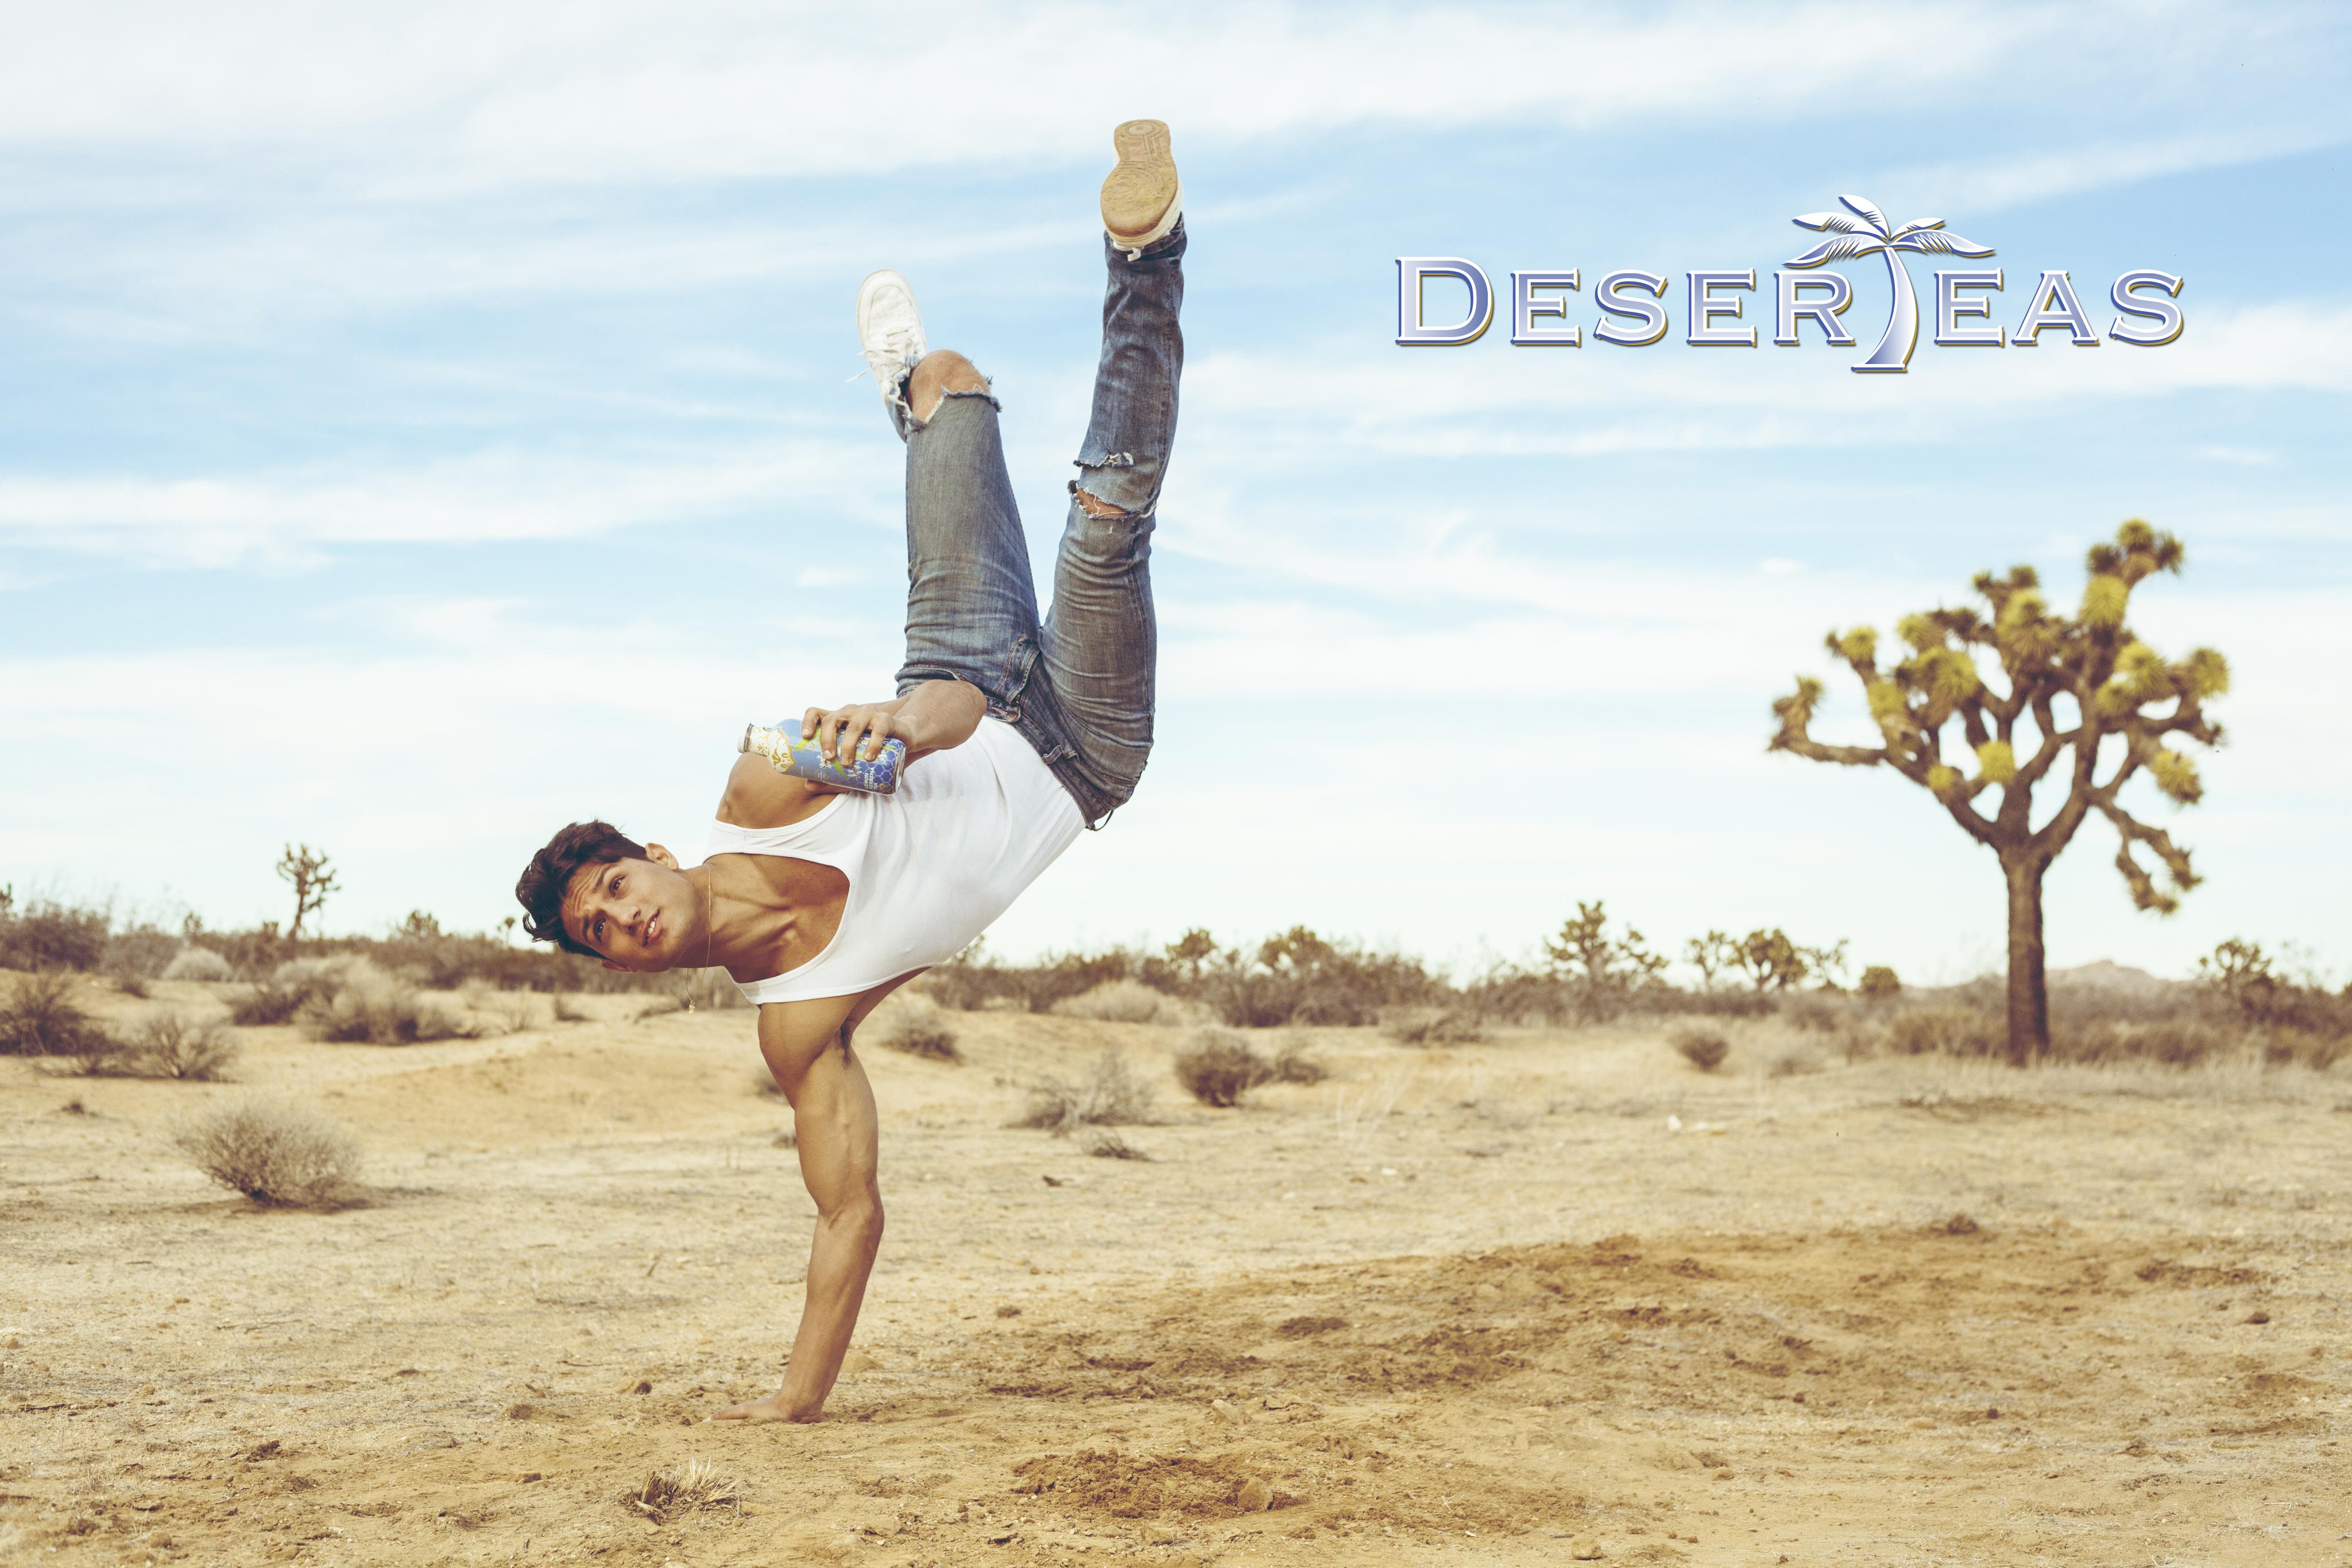 Deserteas 2016